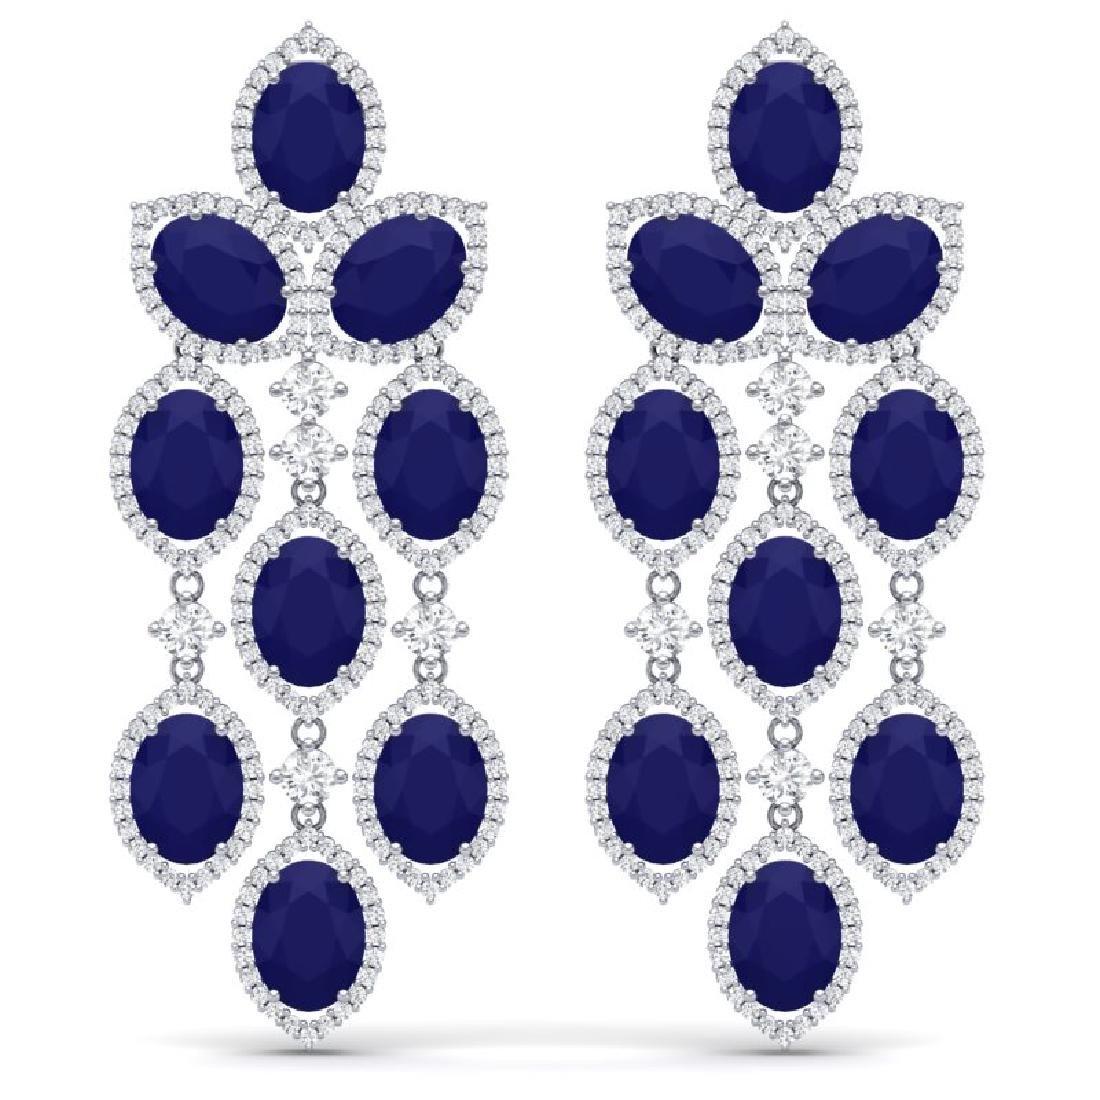 26.15 CTW Royalty Sapphire & VS Diamond Earrings 18K